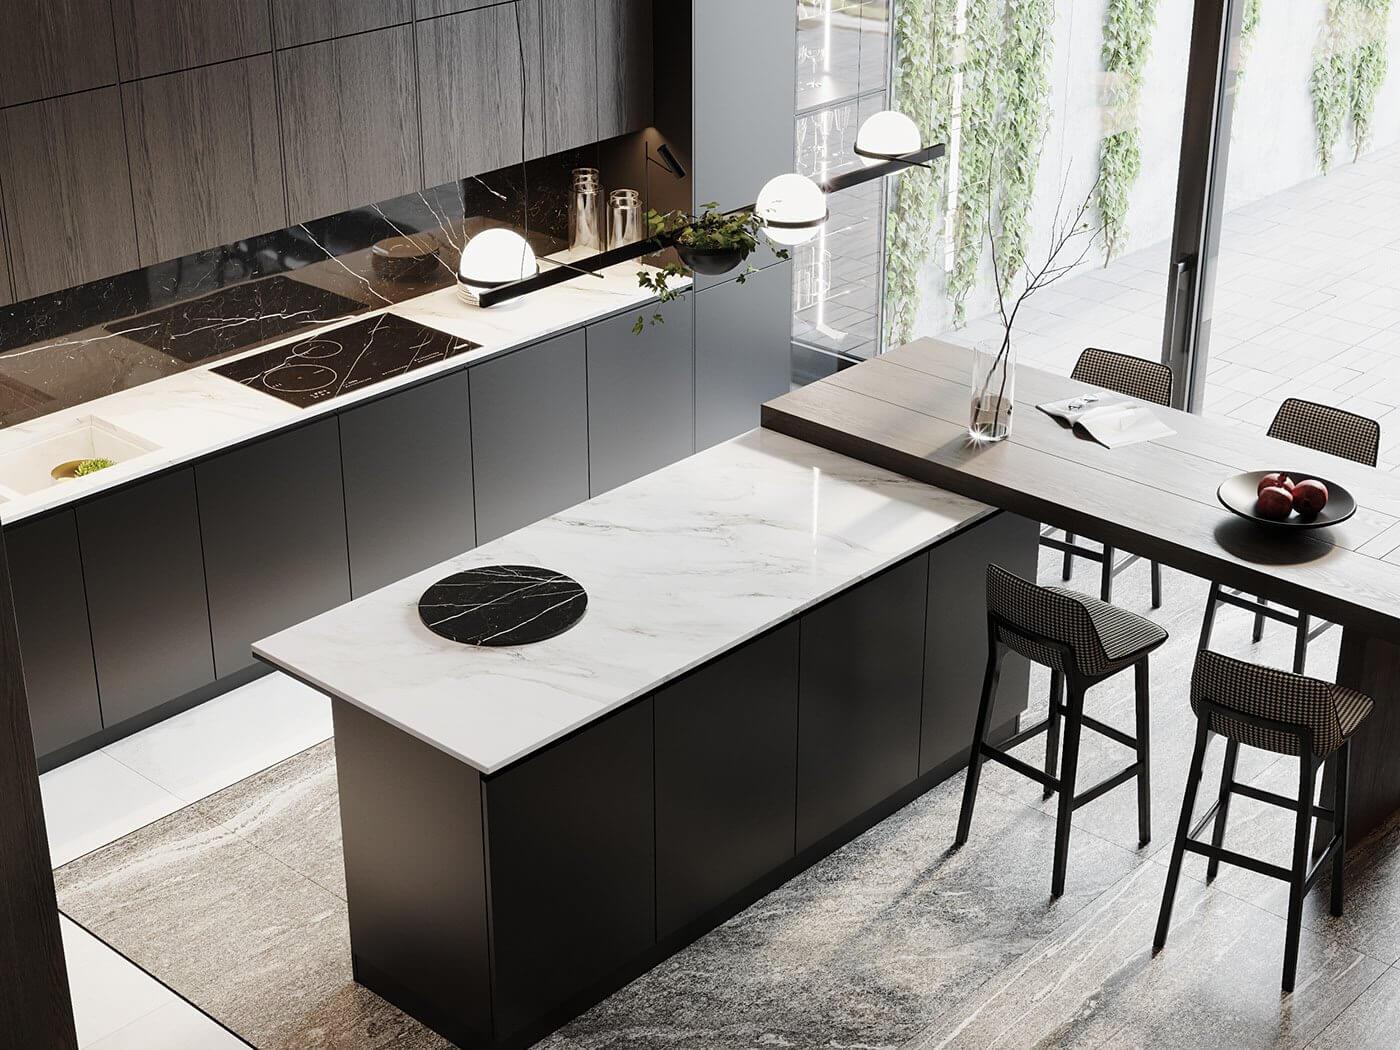 Dark living Apartment kitchen block design - cgi visualization